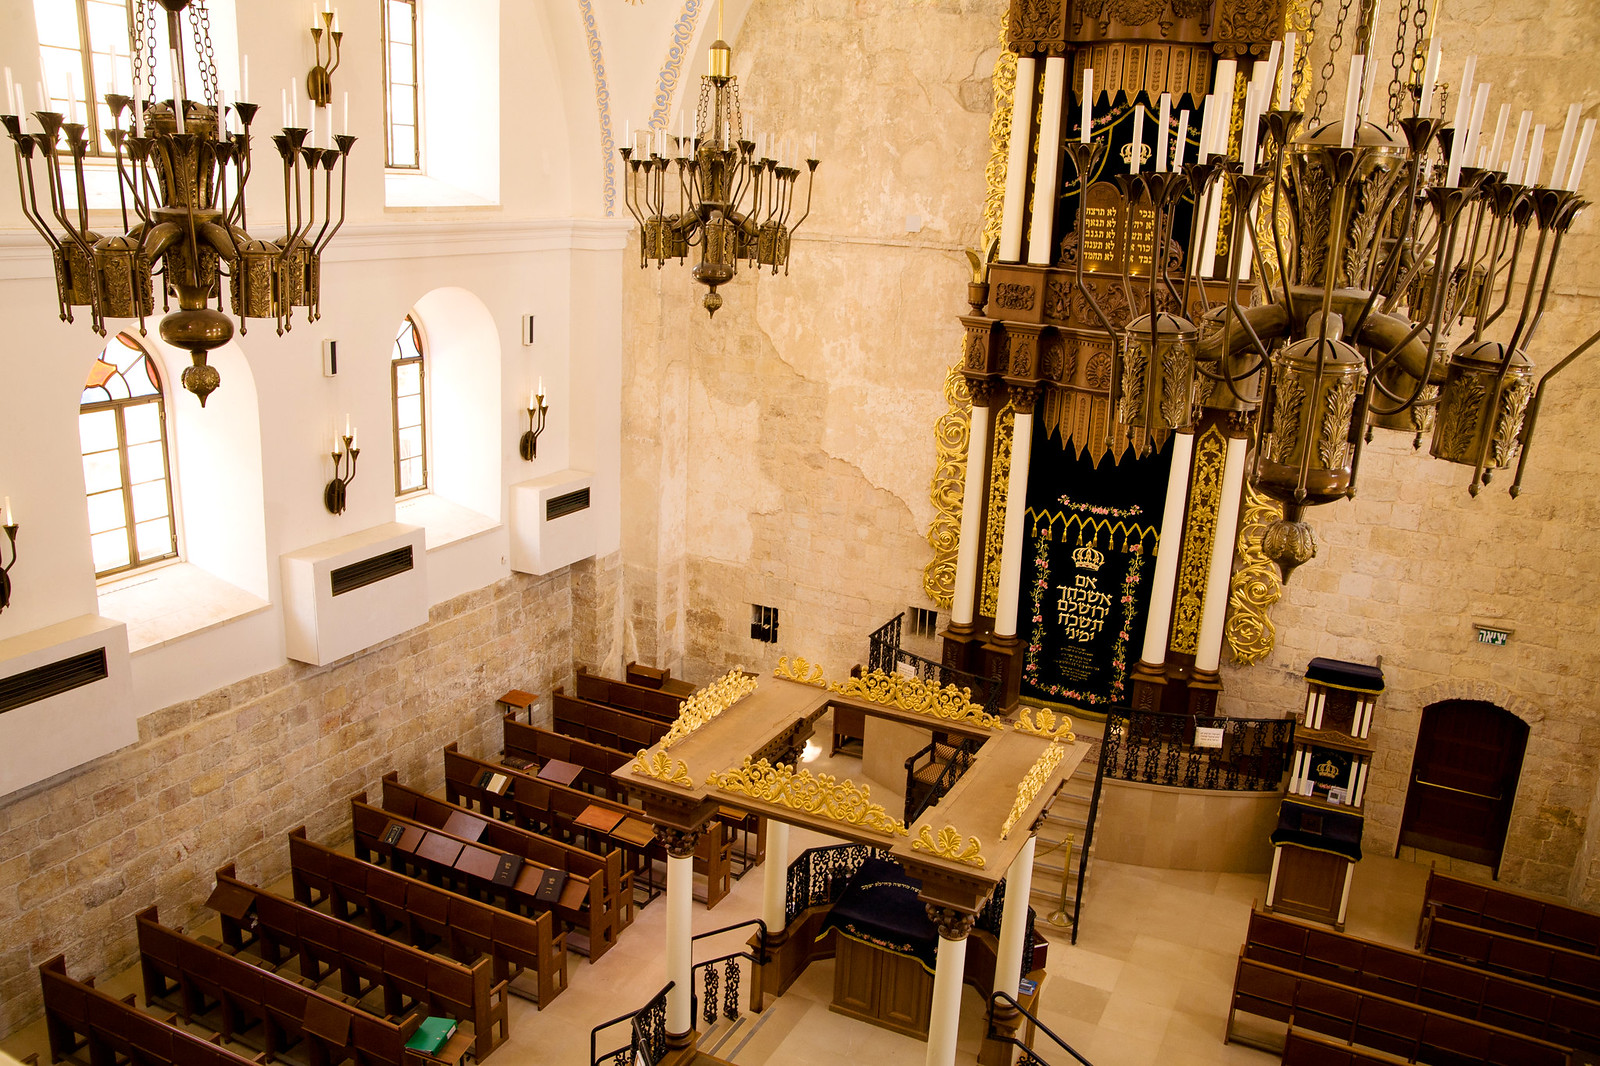 Jerusalem_Hurva Synagogue_4_Noam Chen_IMOT